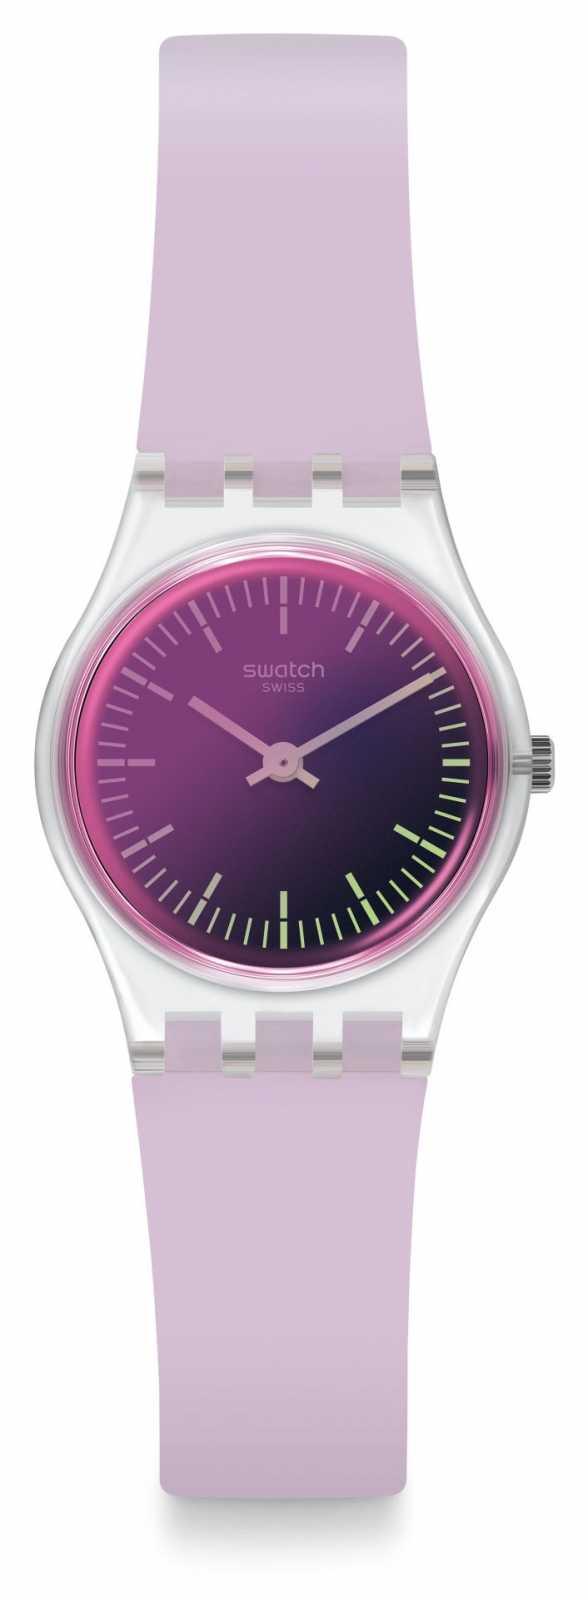 Swatch | Original Lady | Ultraviolet Watch | LK390